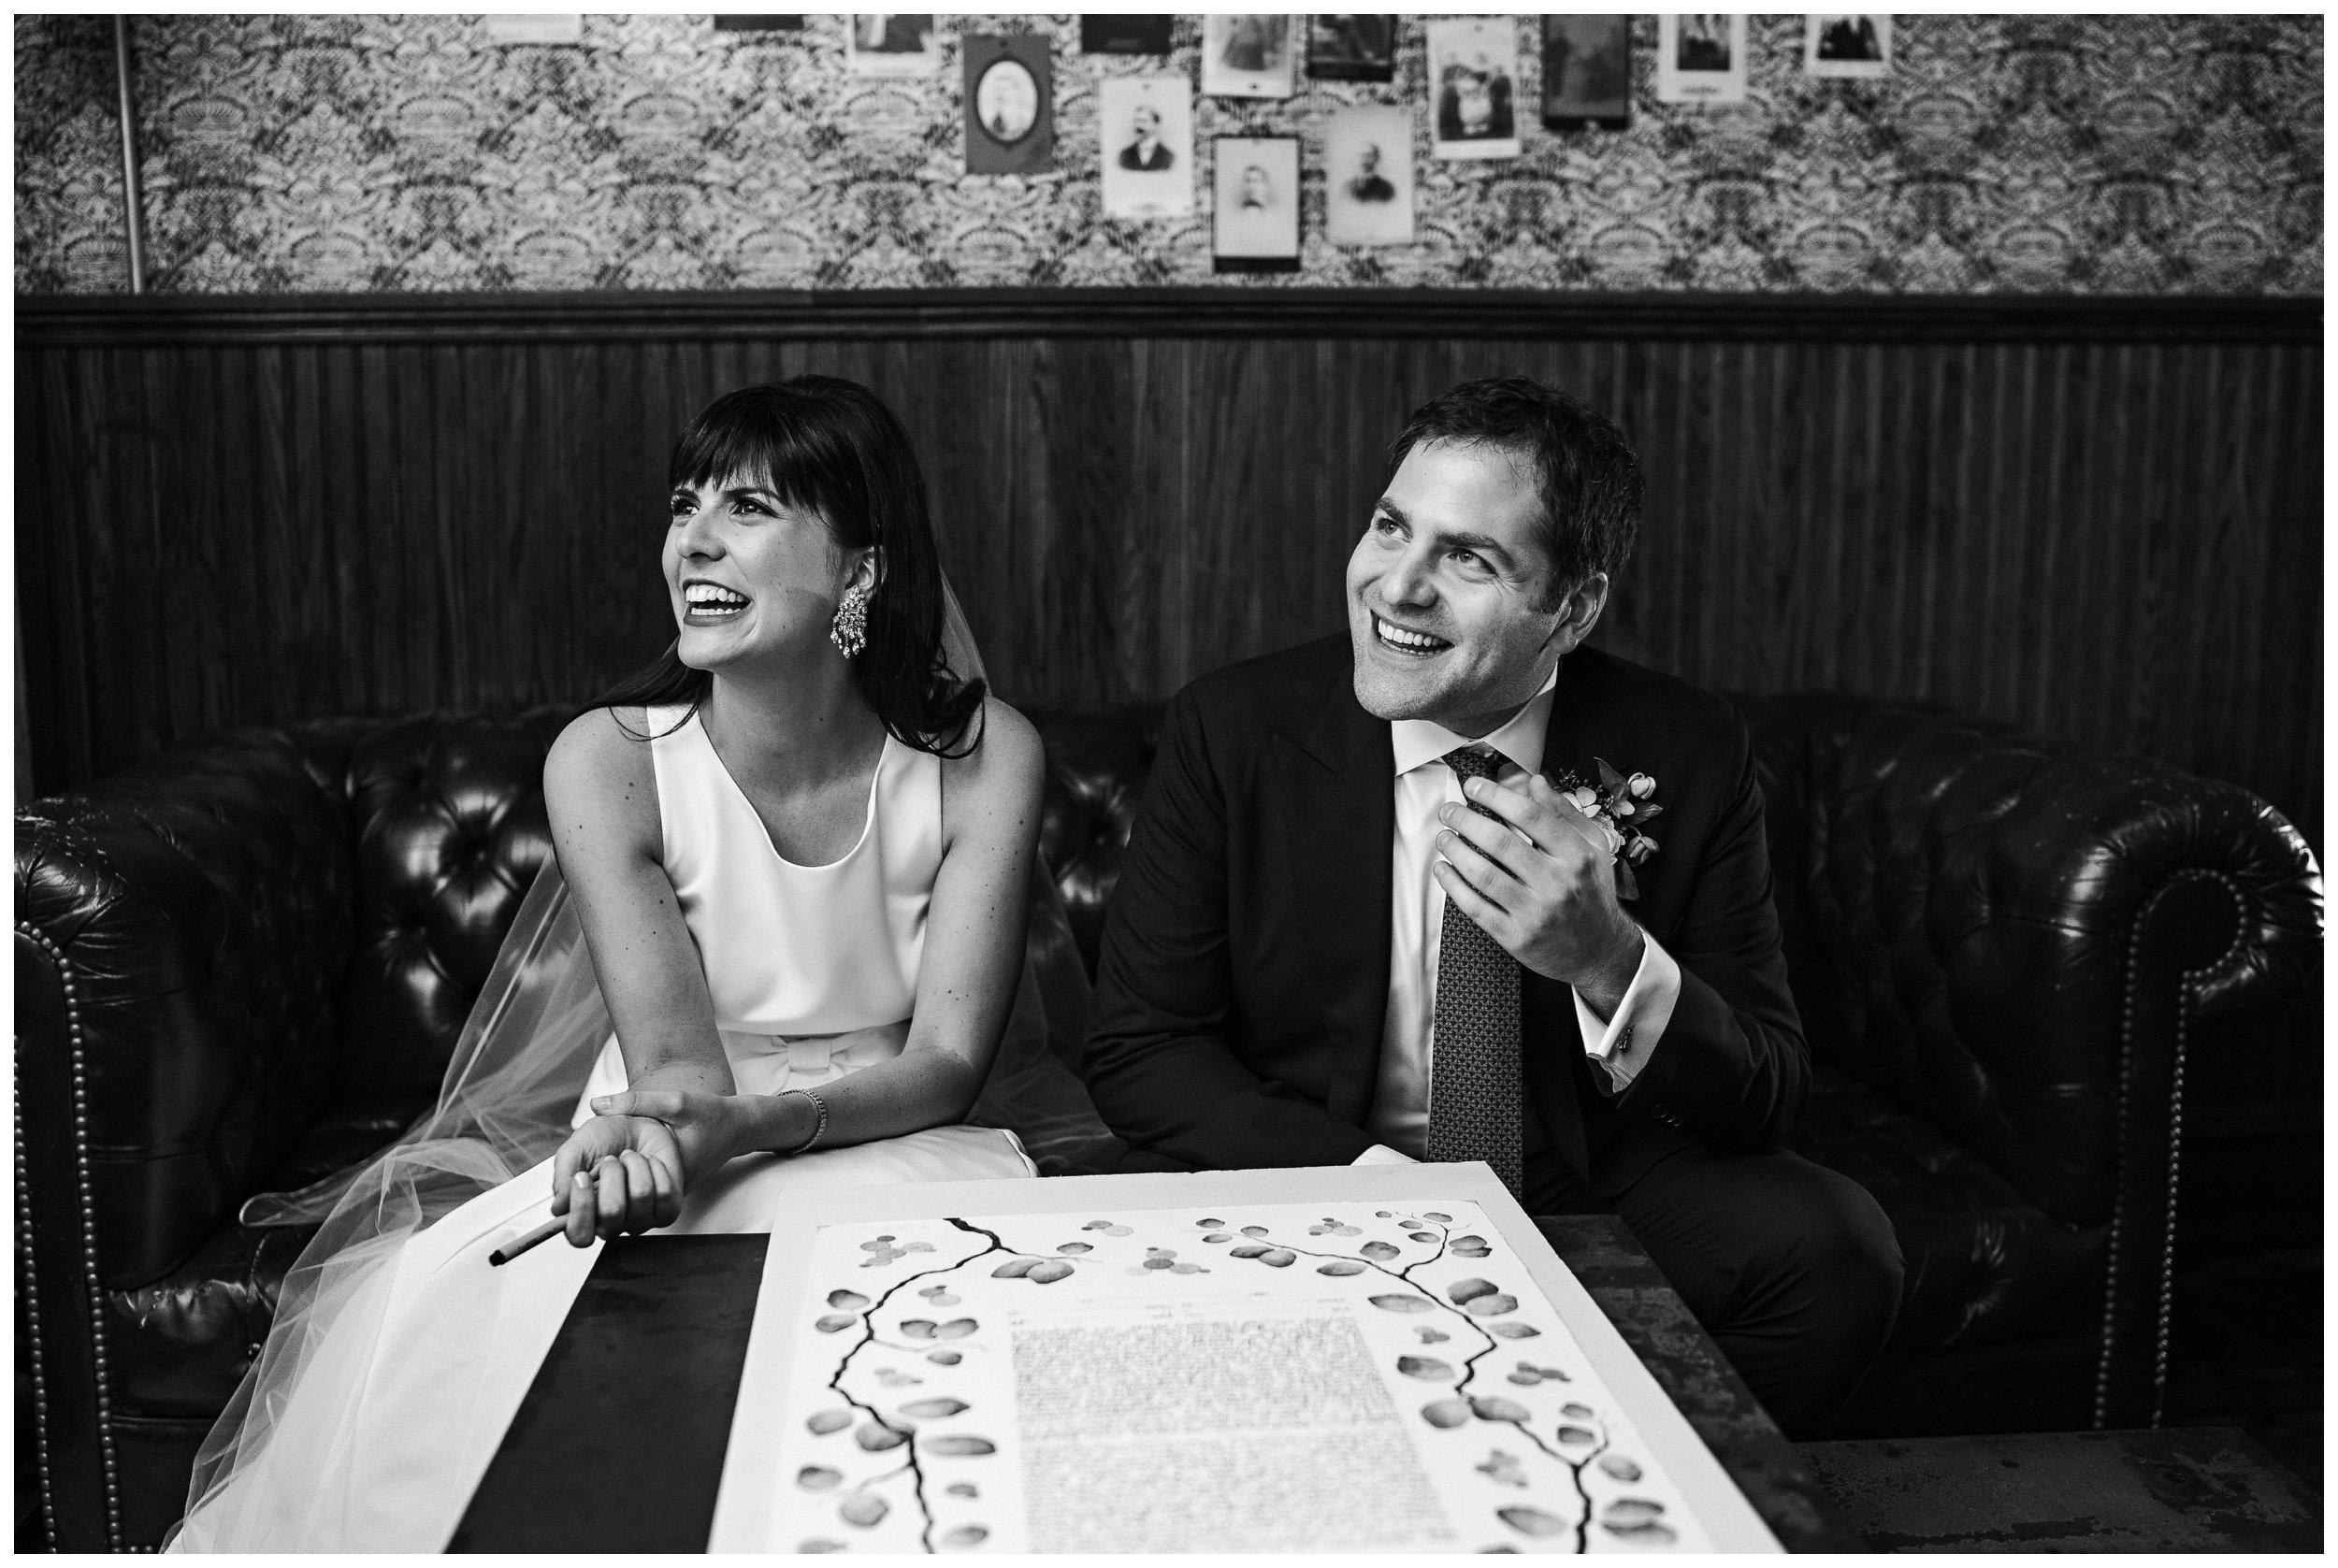 brooklyn winery wedding ketubah signing